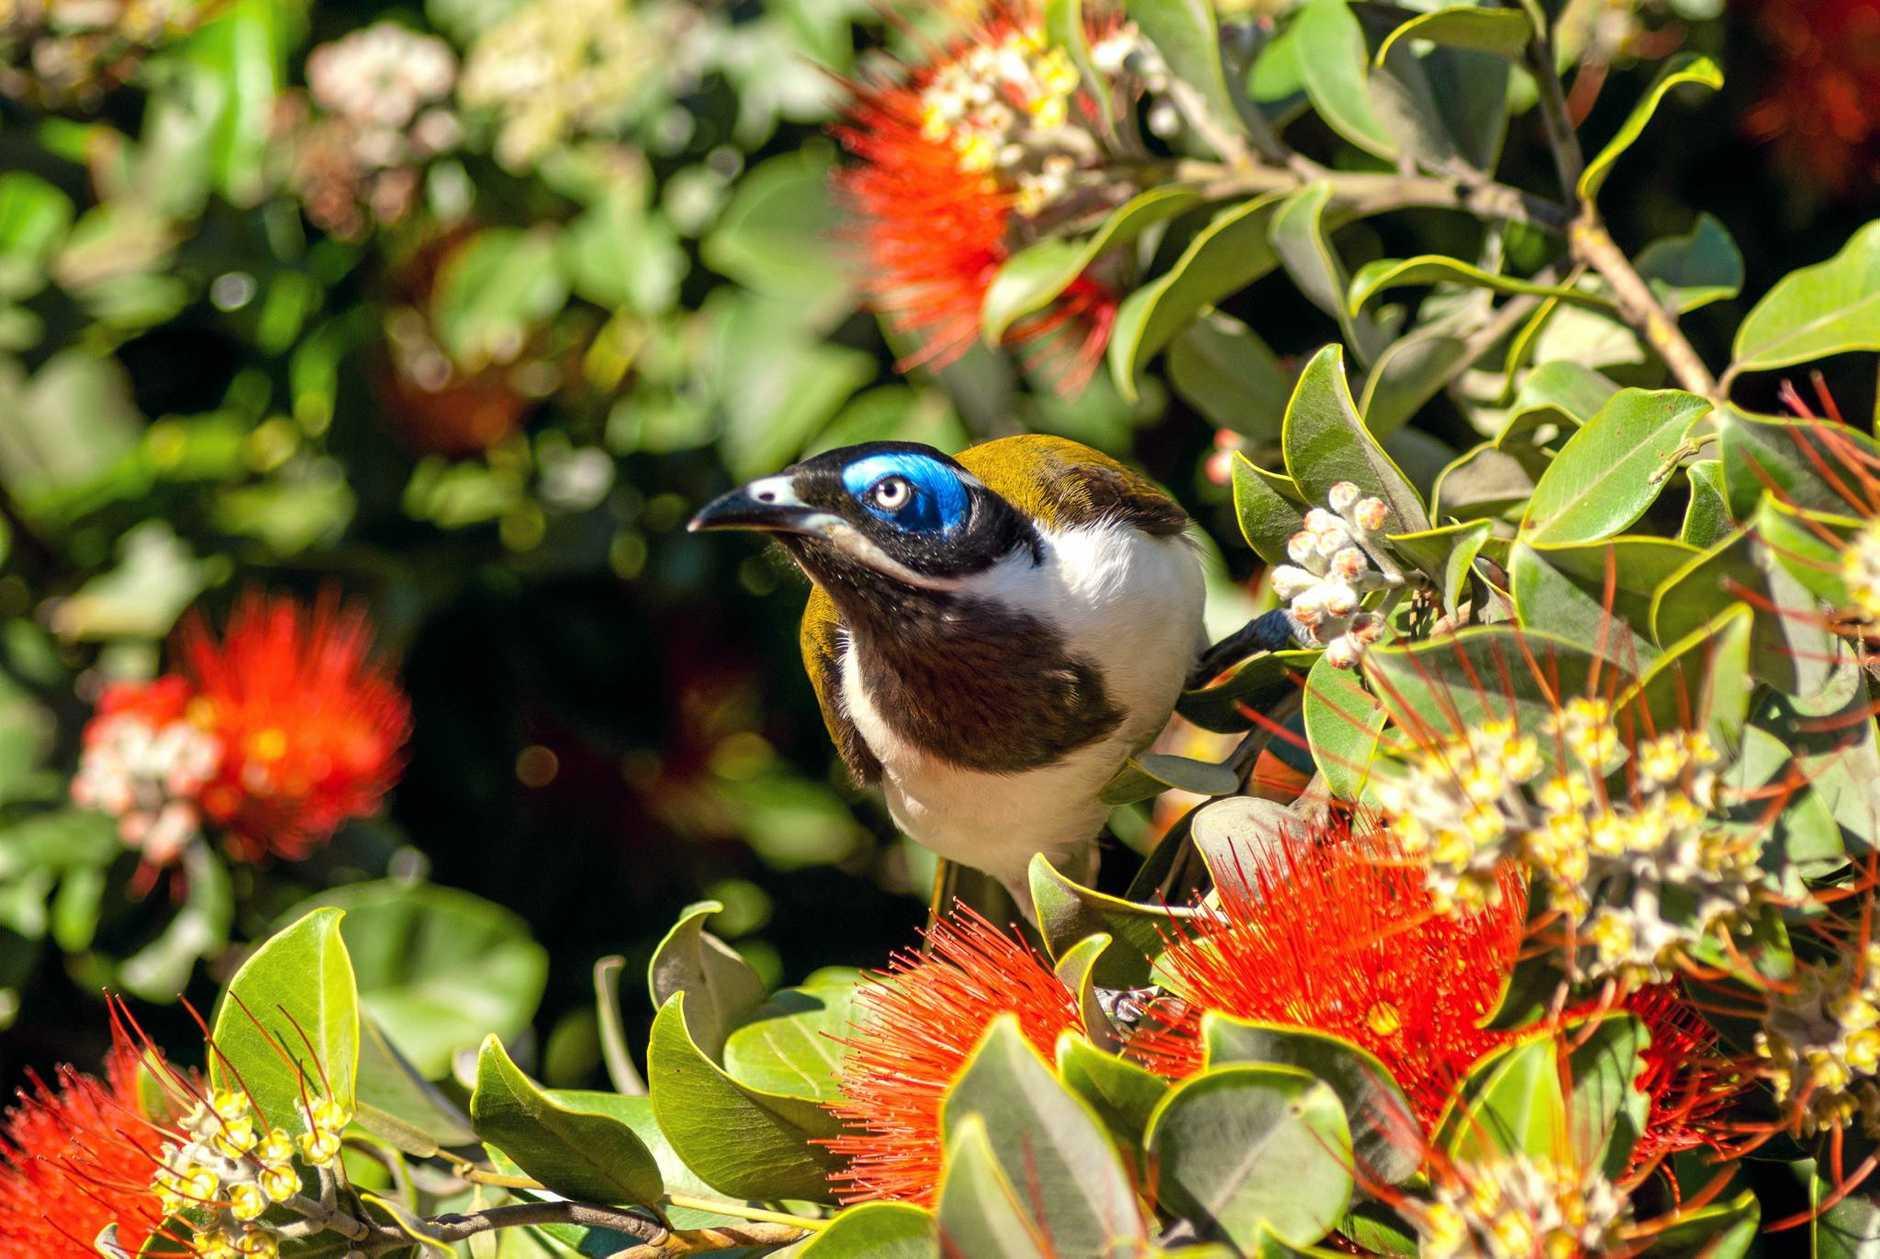 YARD FRIENDS: Blue-faced Honeyeater or Bananabird, a colourful bird found in Australia.